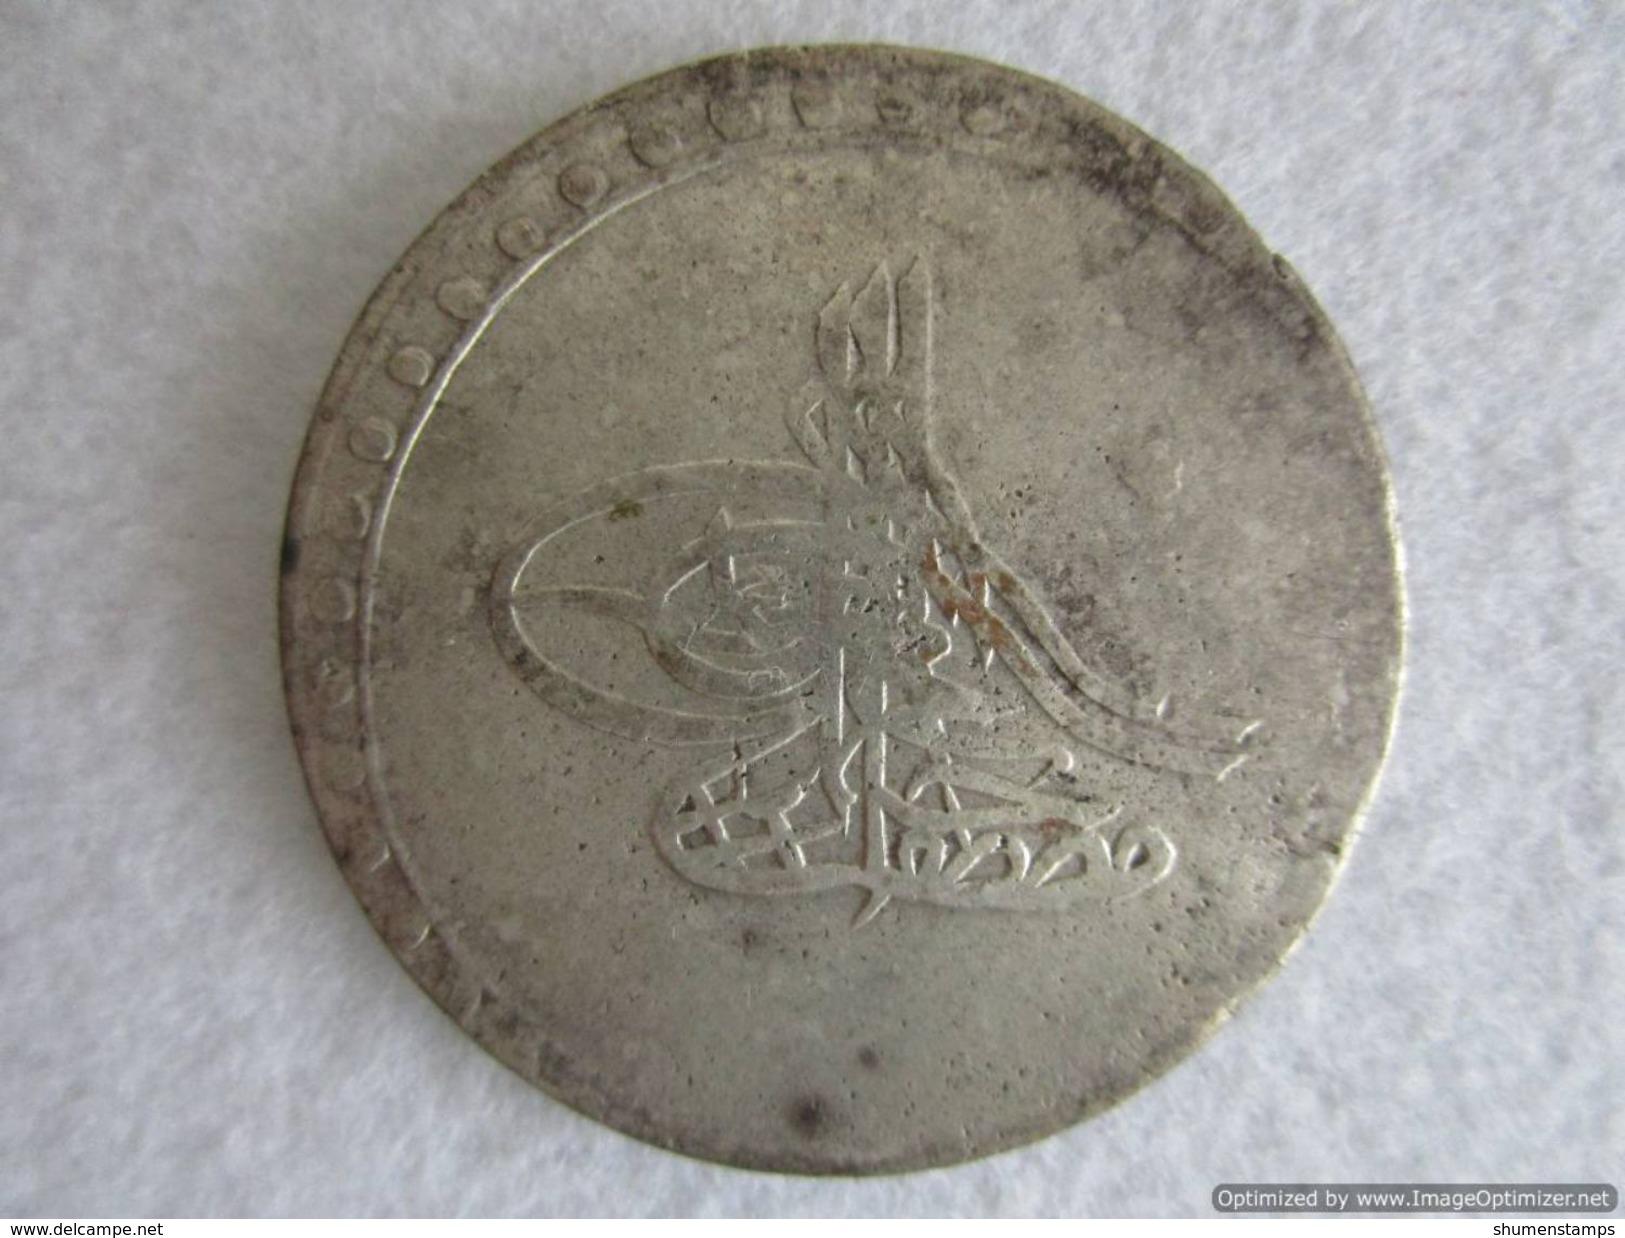 Turkey Ottoman Empire, MUSTAFA III, PIASTRE 1171/4, SILVER 18.42 G, Collectible! - Islamic